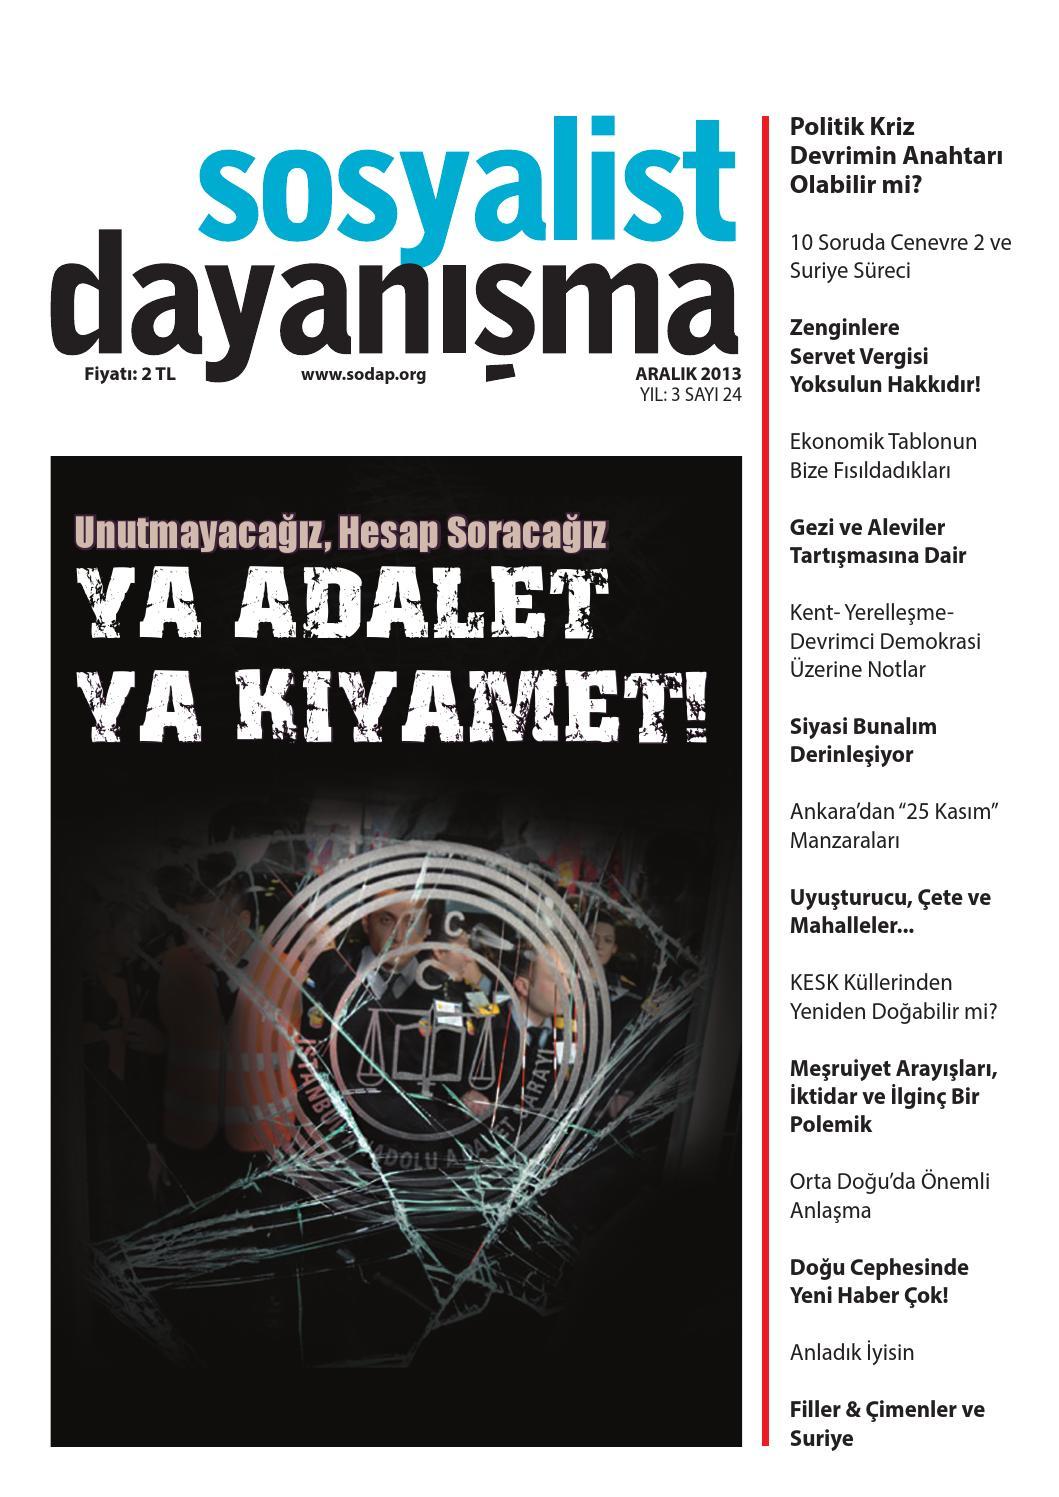 72b20b2fddce5 Sosyalist Dayanışma Dergisi Aralık 2013 24. Sayı by Sosyalist Dayanışma -  issuu